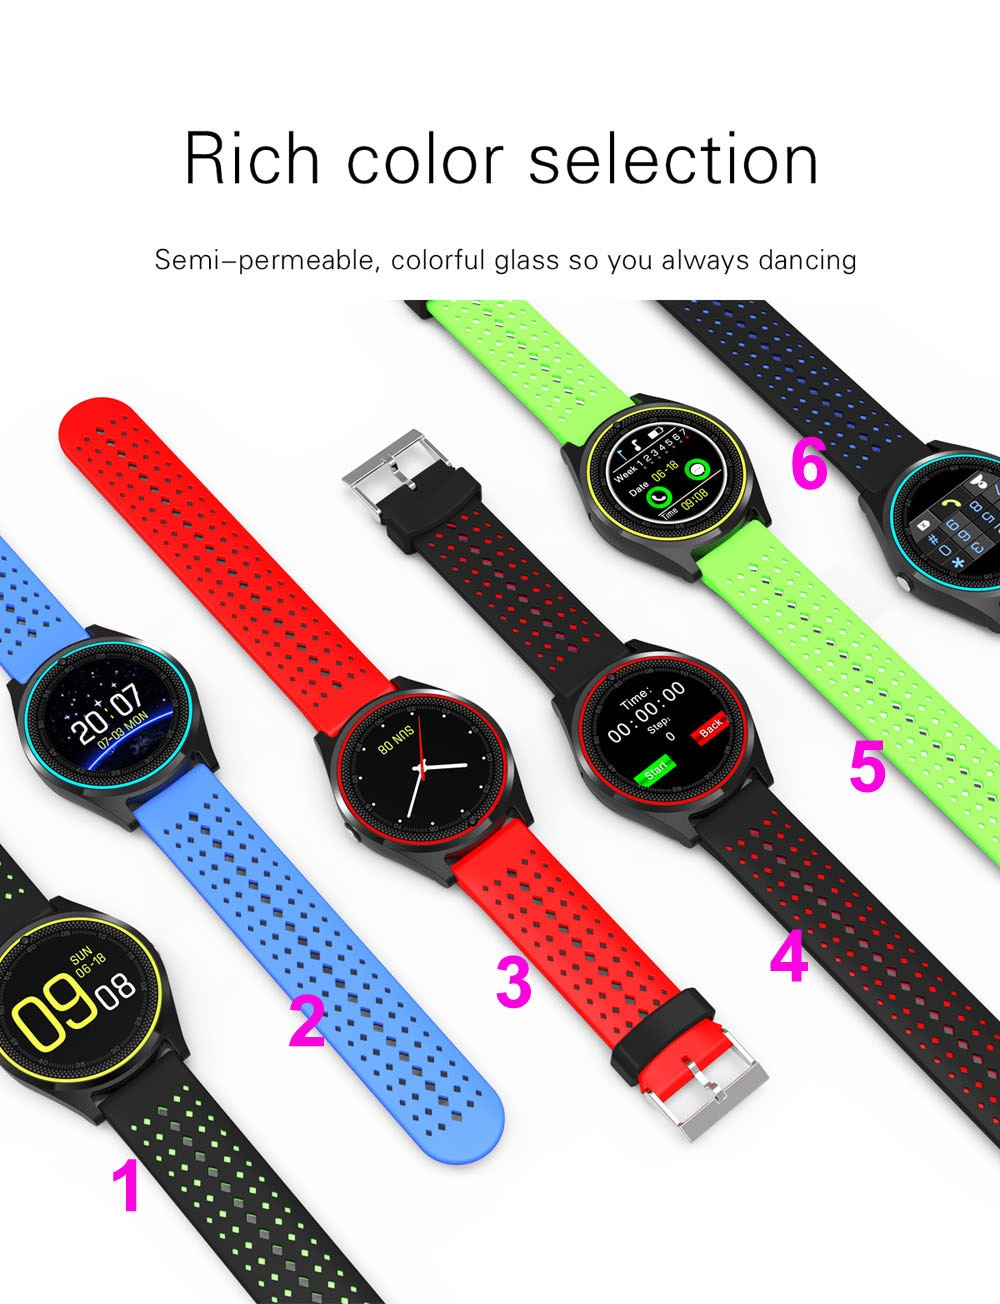 Reloj inteligente Bluetooth 20 Uds V9 micro-SIM 2G con cámara podómetro salud deporte MP3 música reloj inteligente para Android